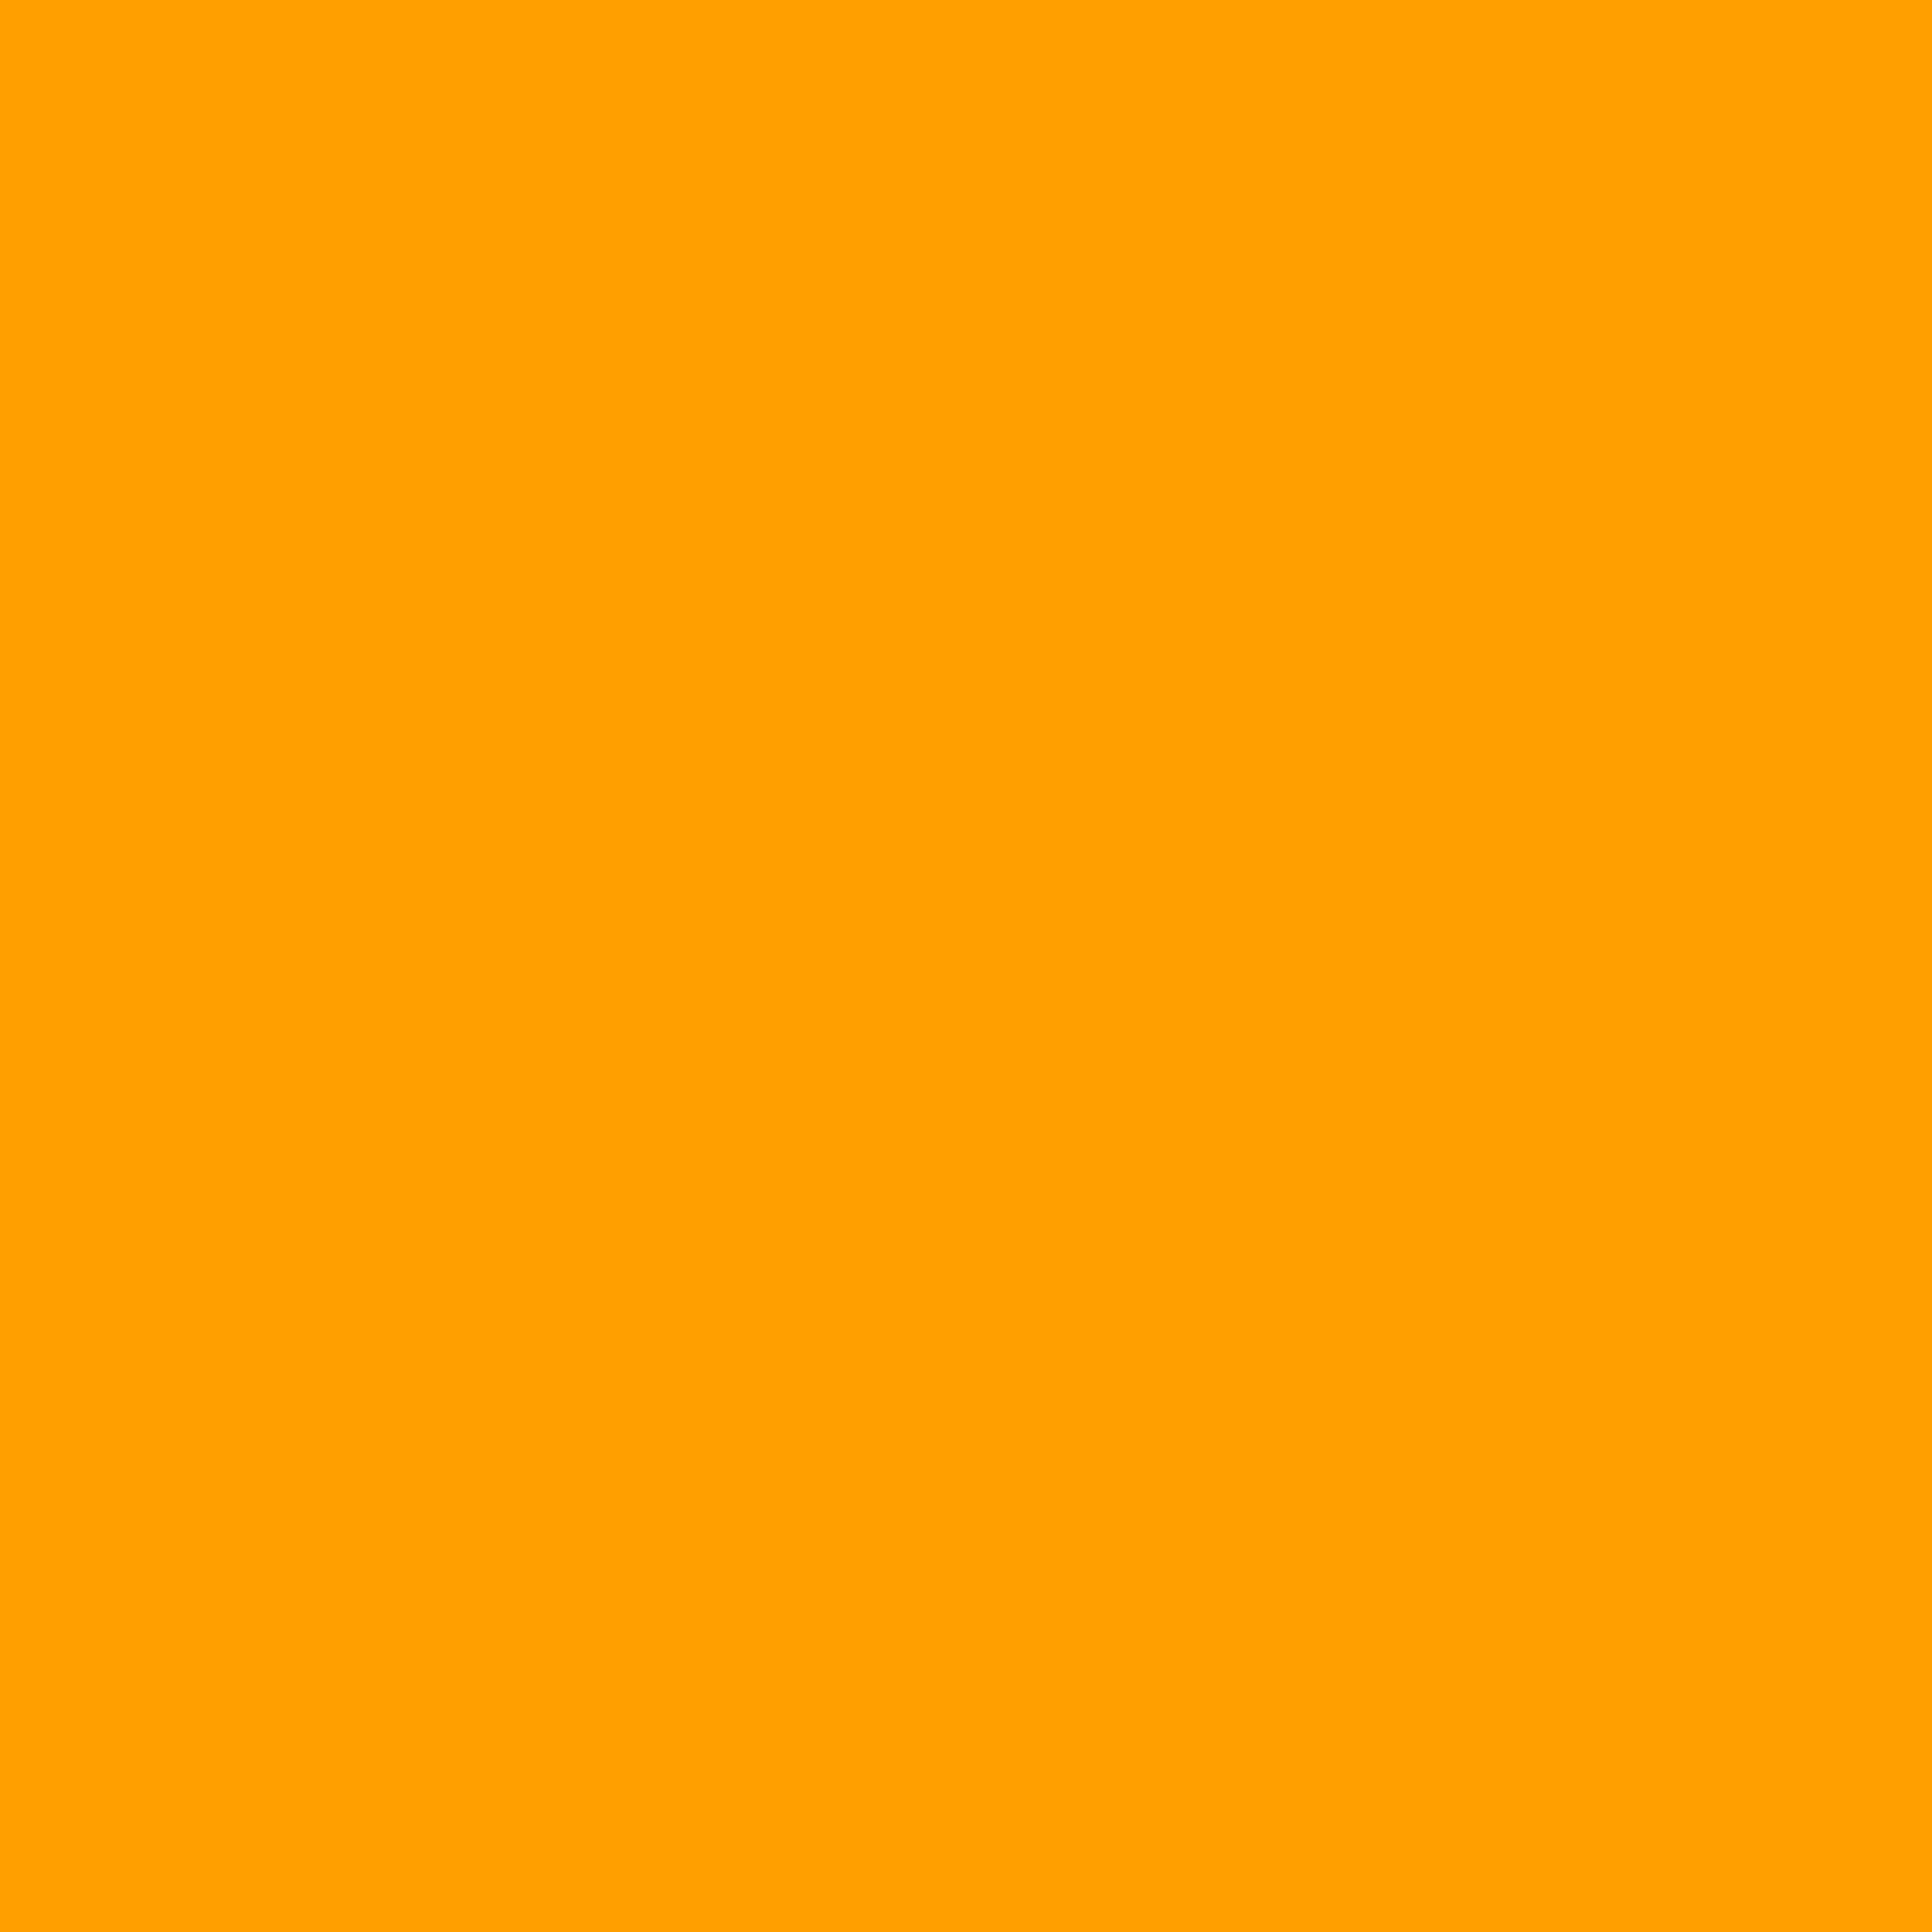 3600x3600 Orange Peel Solid Color Background